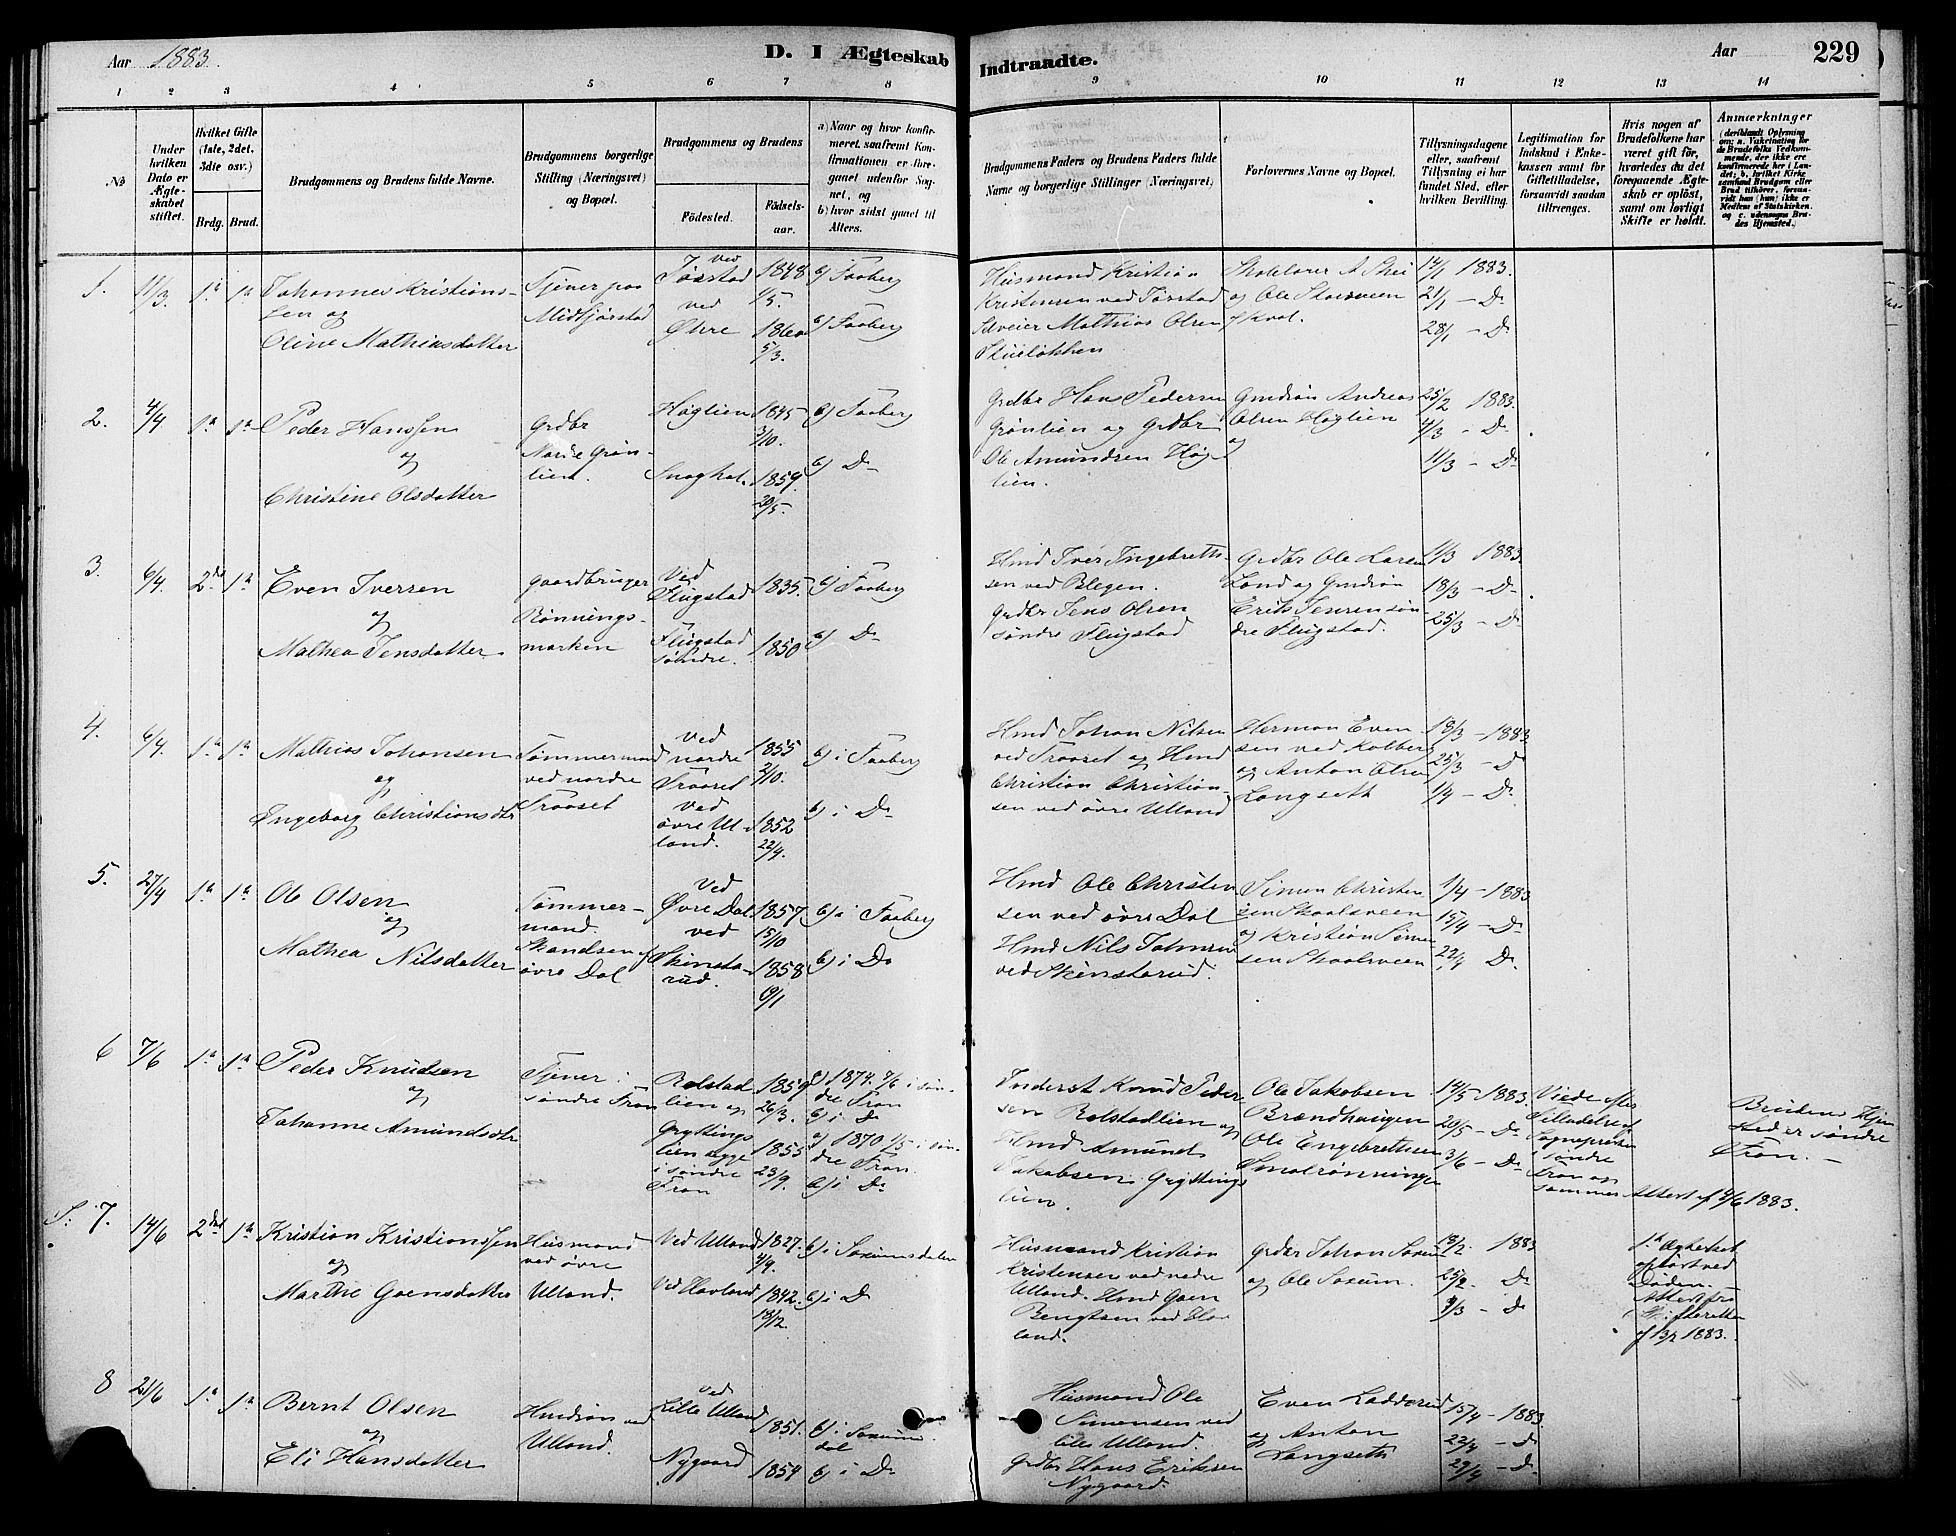 SAH, Fåberg prestekontor, Ministerialbok nr. 8, 1879-1898, s. 229